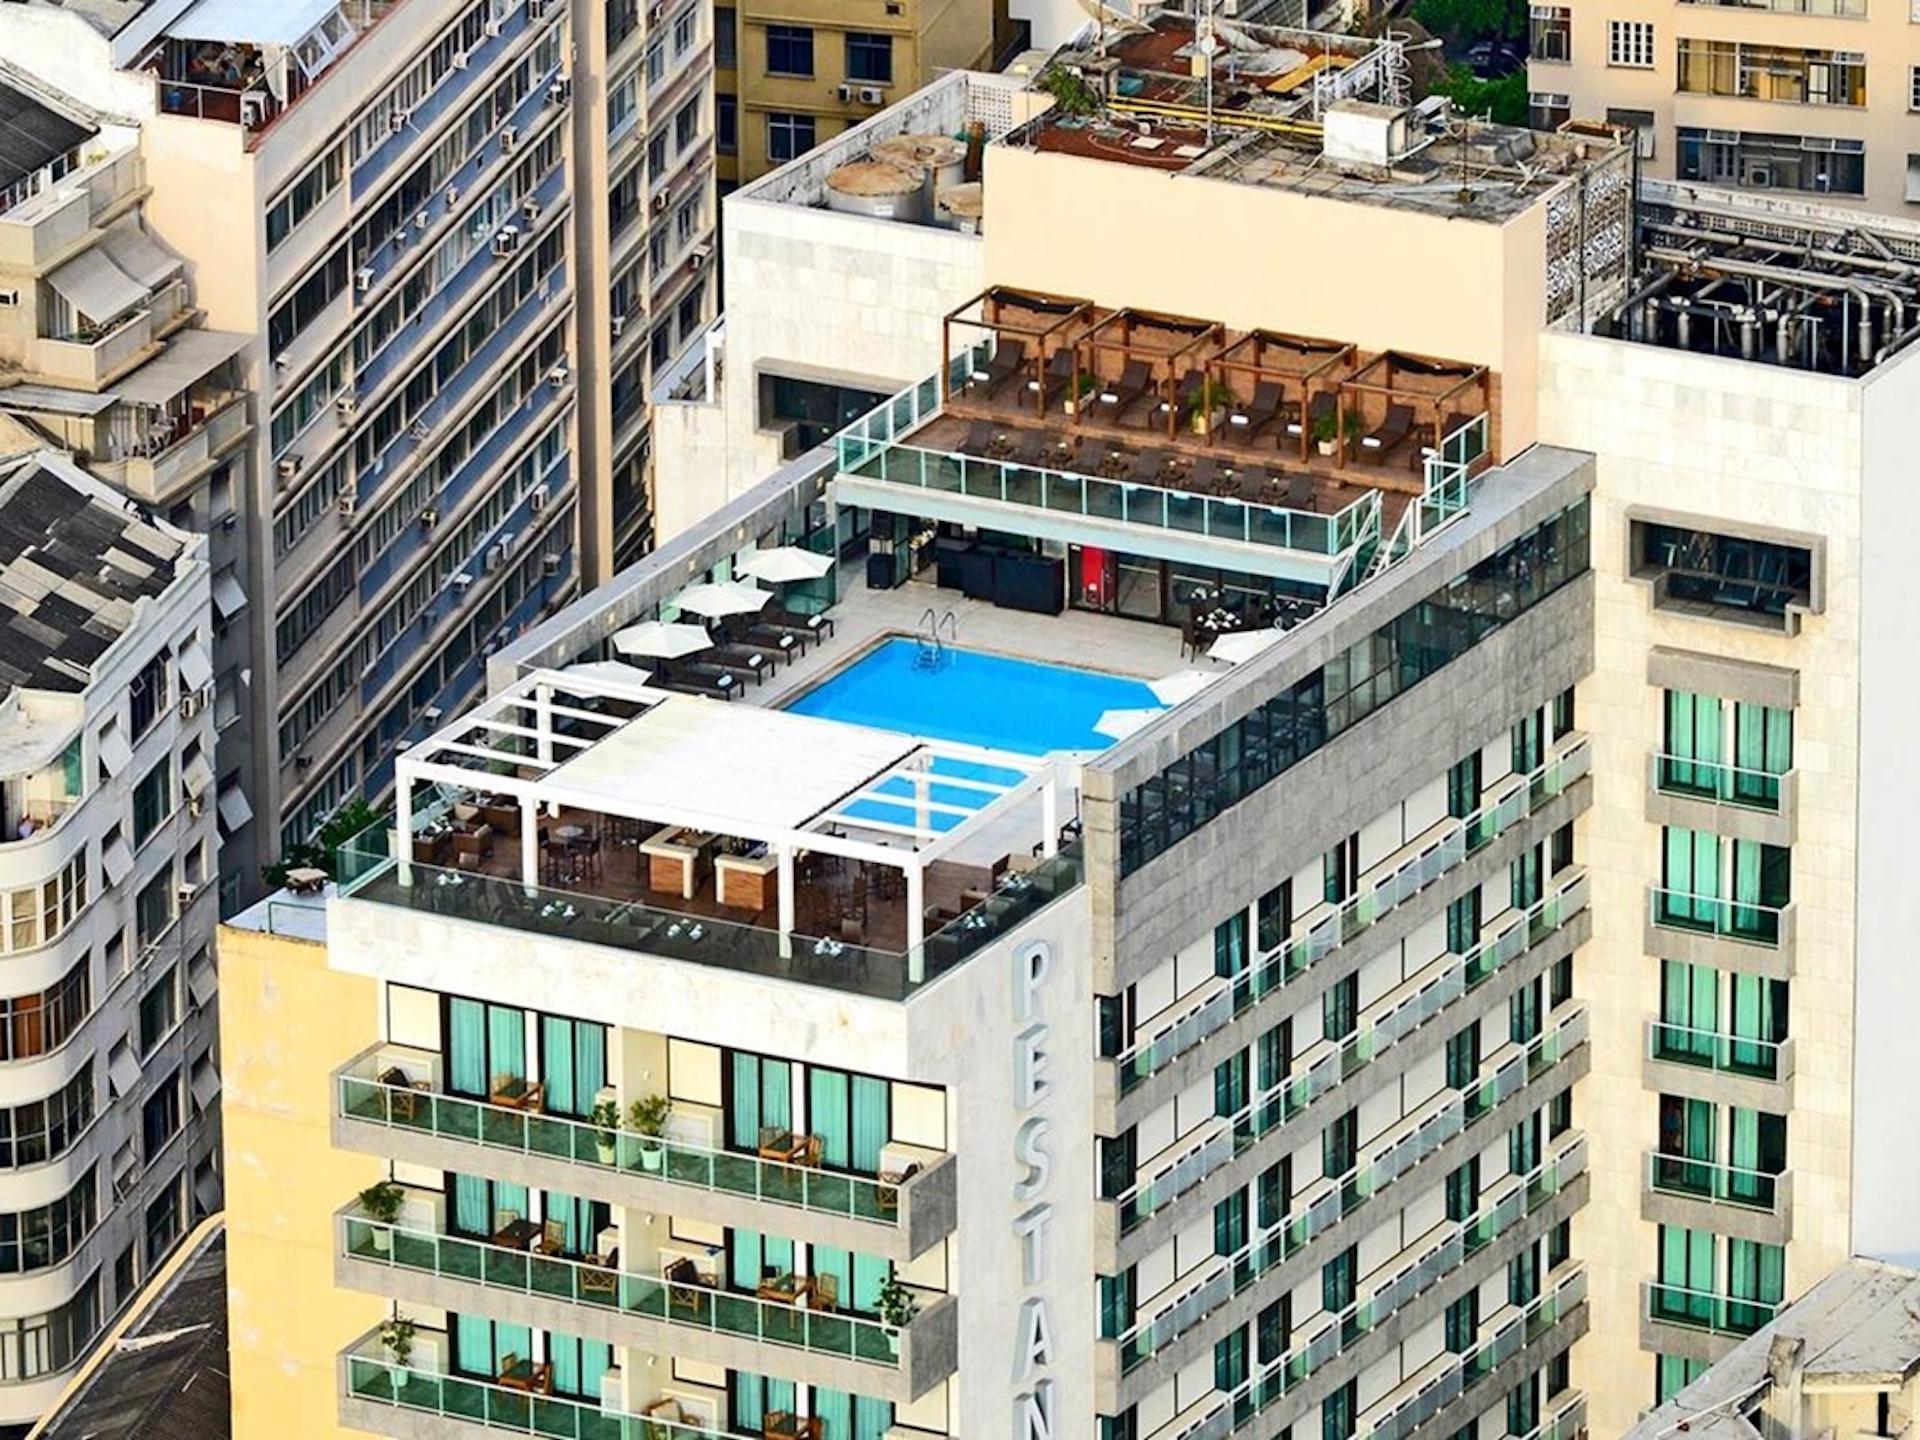 Hotel Pestana Rio Atlantica Dachterrasse mit Pool in Copabana